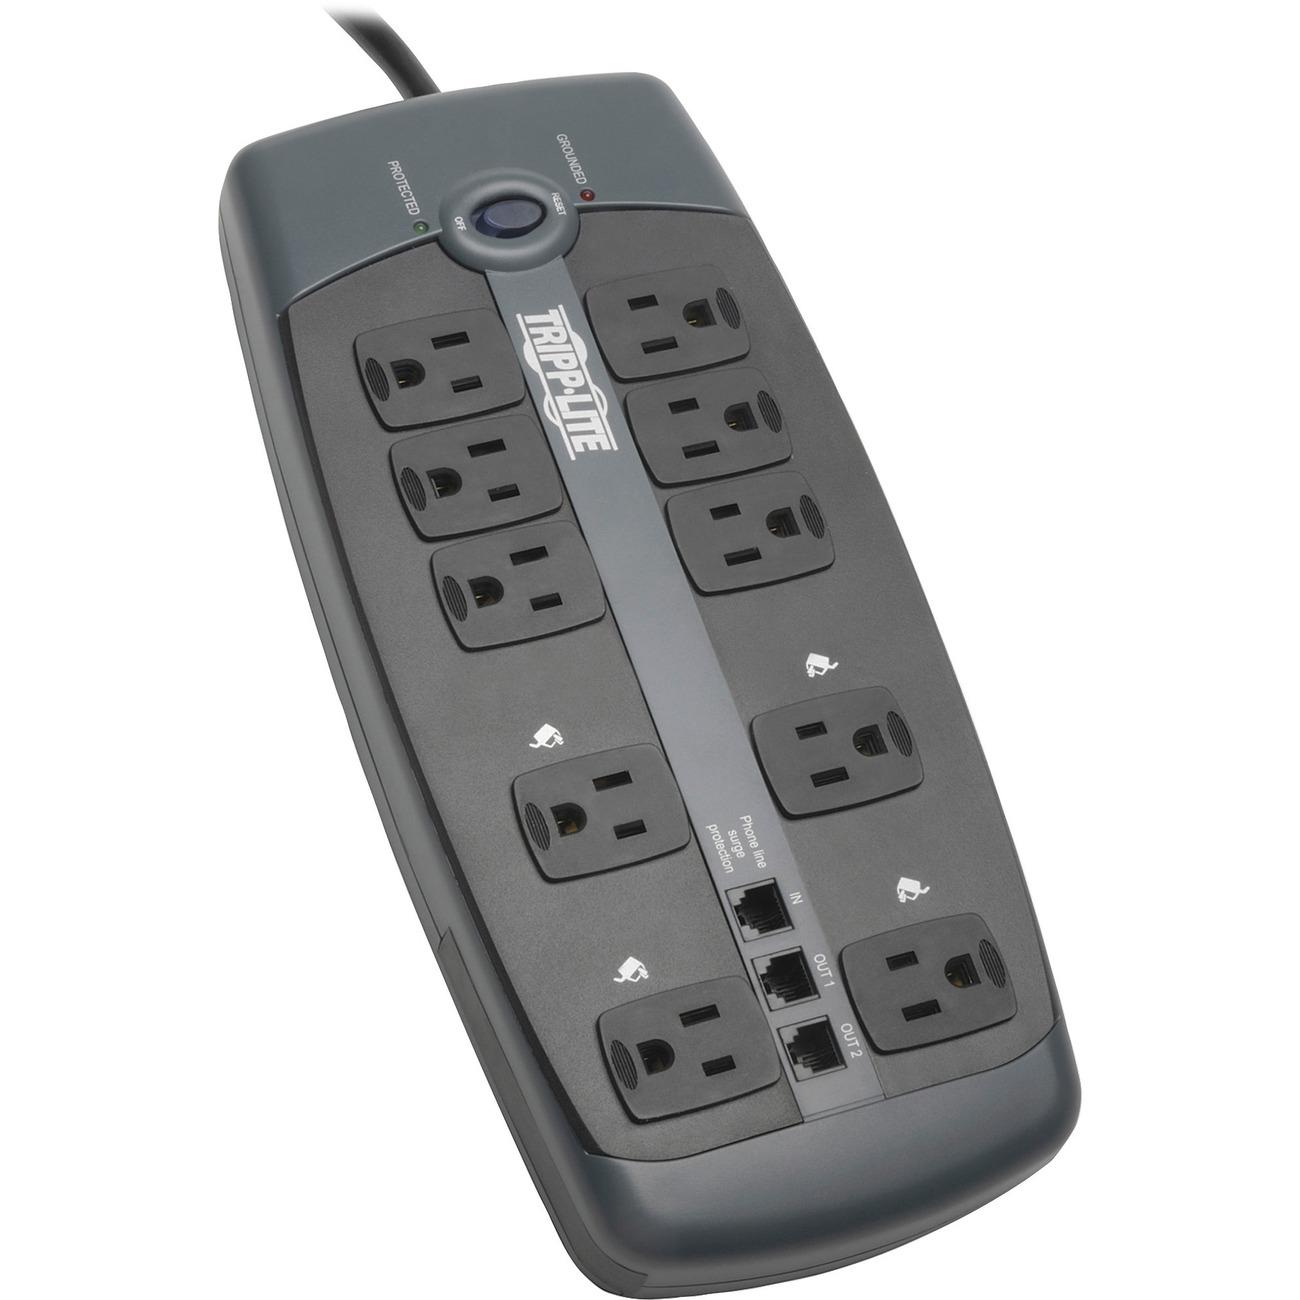 hight resolution of tripp lite surge protector 120v 10 outlet rj11 8 cord 2395 joule 10 x nema 5 15r 1800 va 2395 j 120 v ac input 120 v ac output fax modem phone